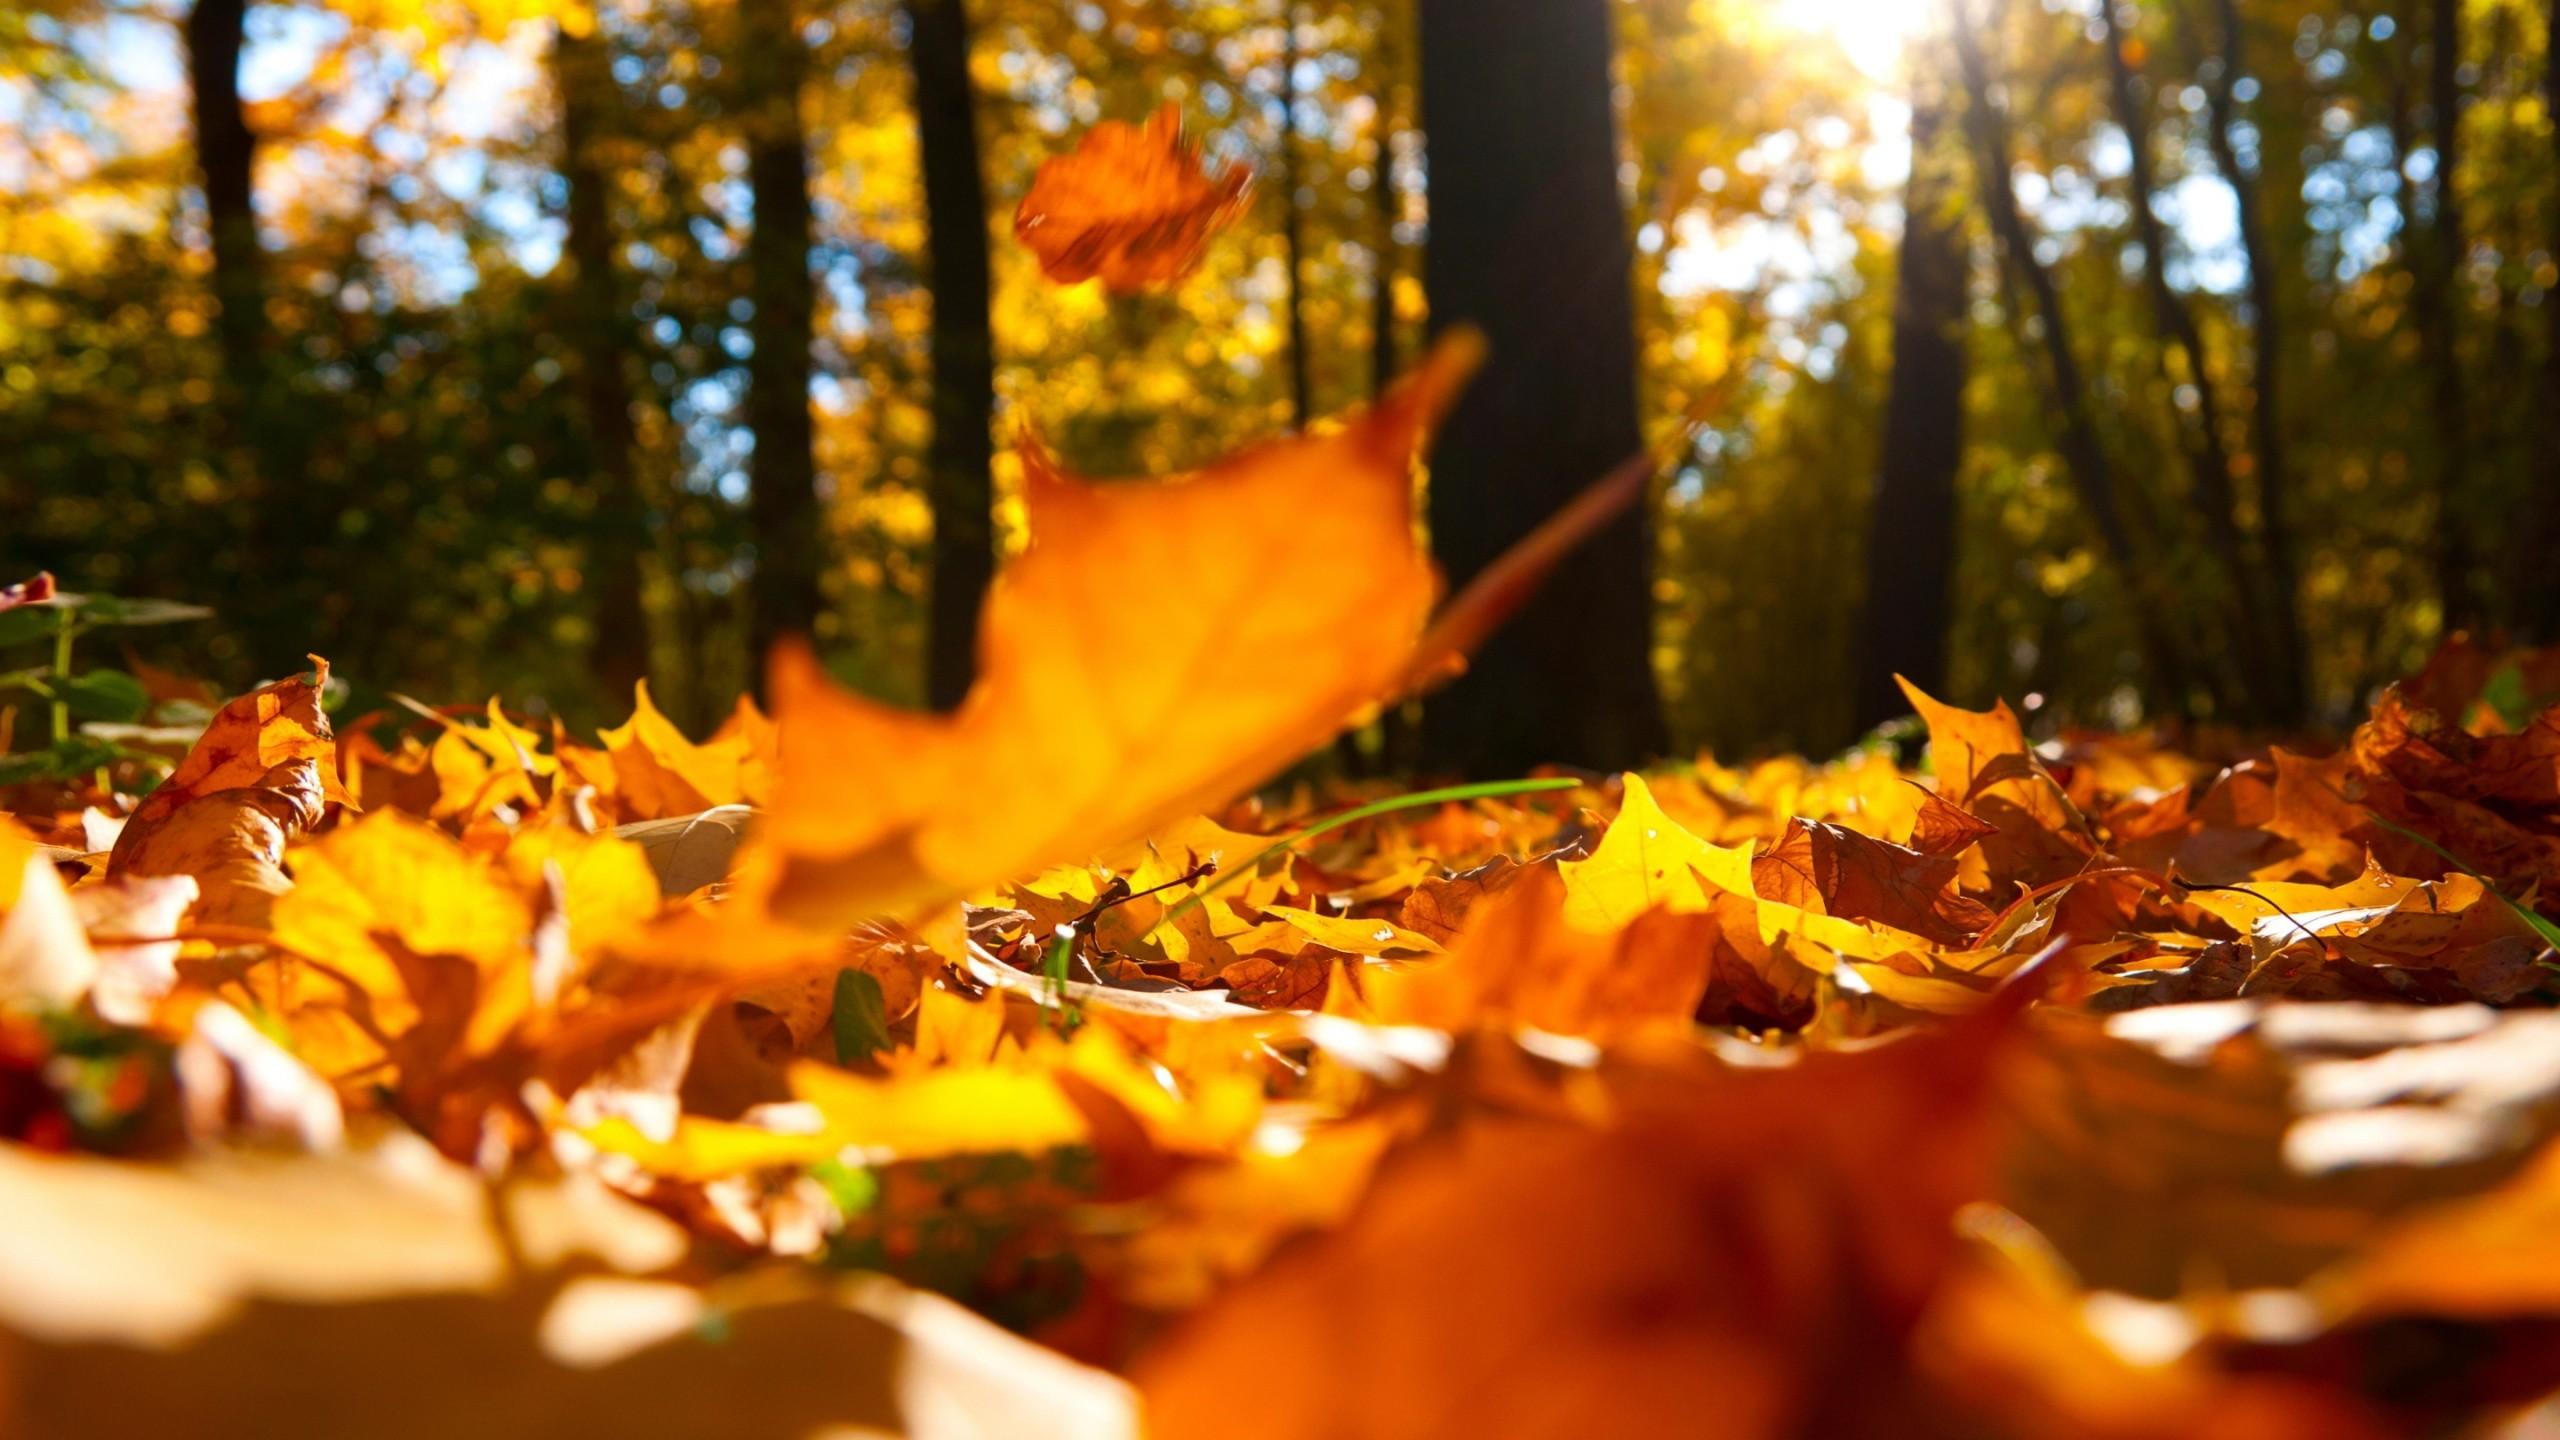 High Resolution Wallpaper Fall Leaves Christian Autumn Wallpaper 36 Images